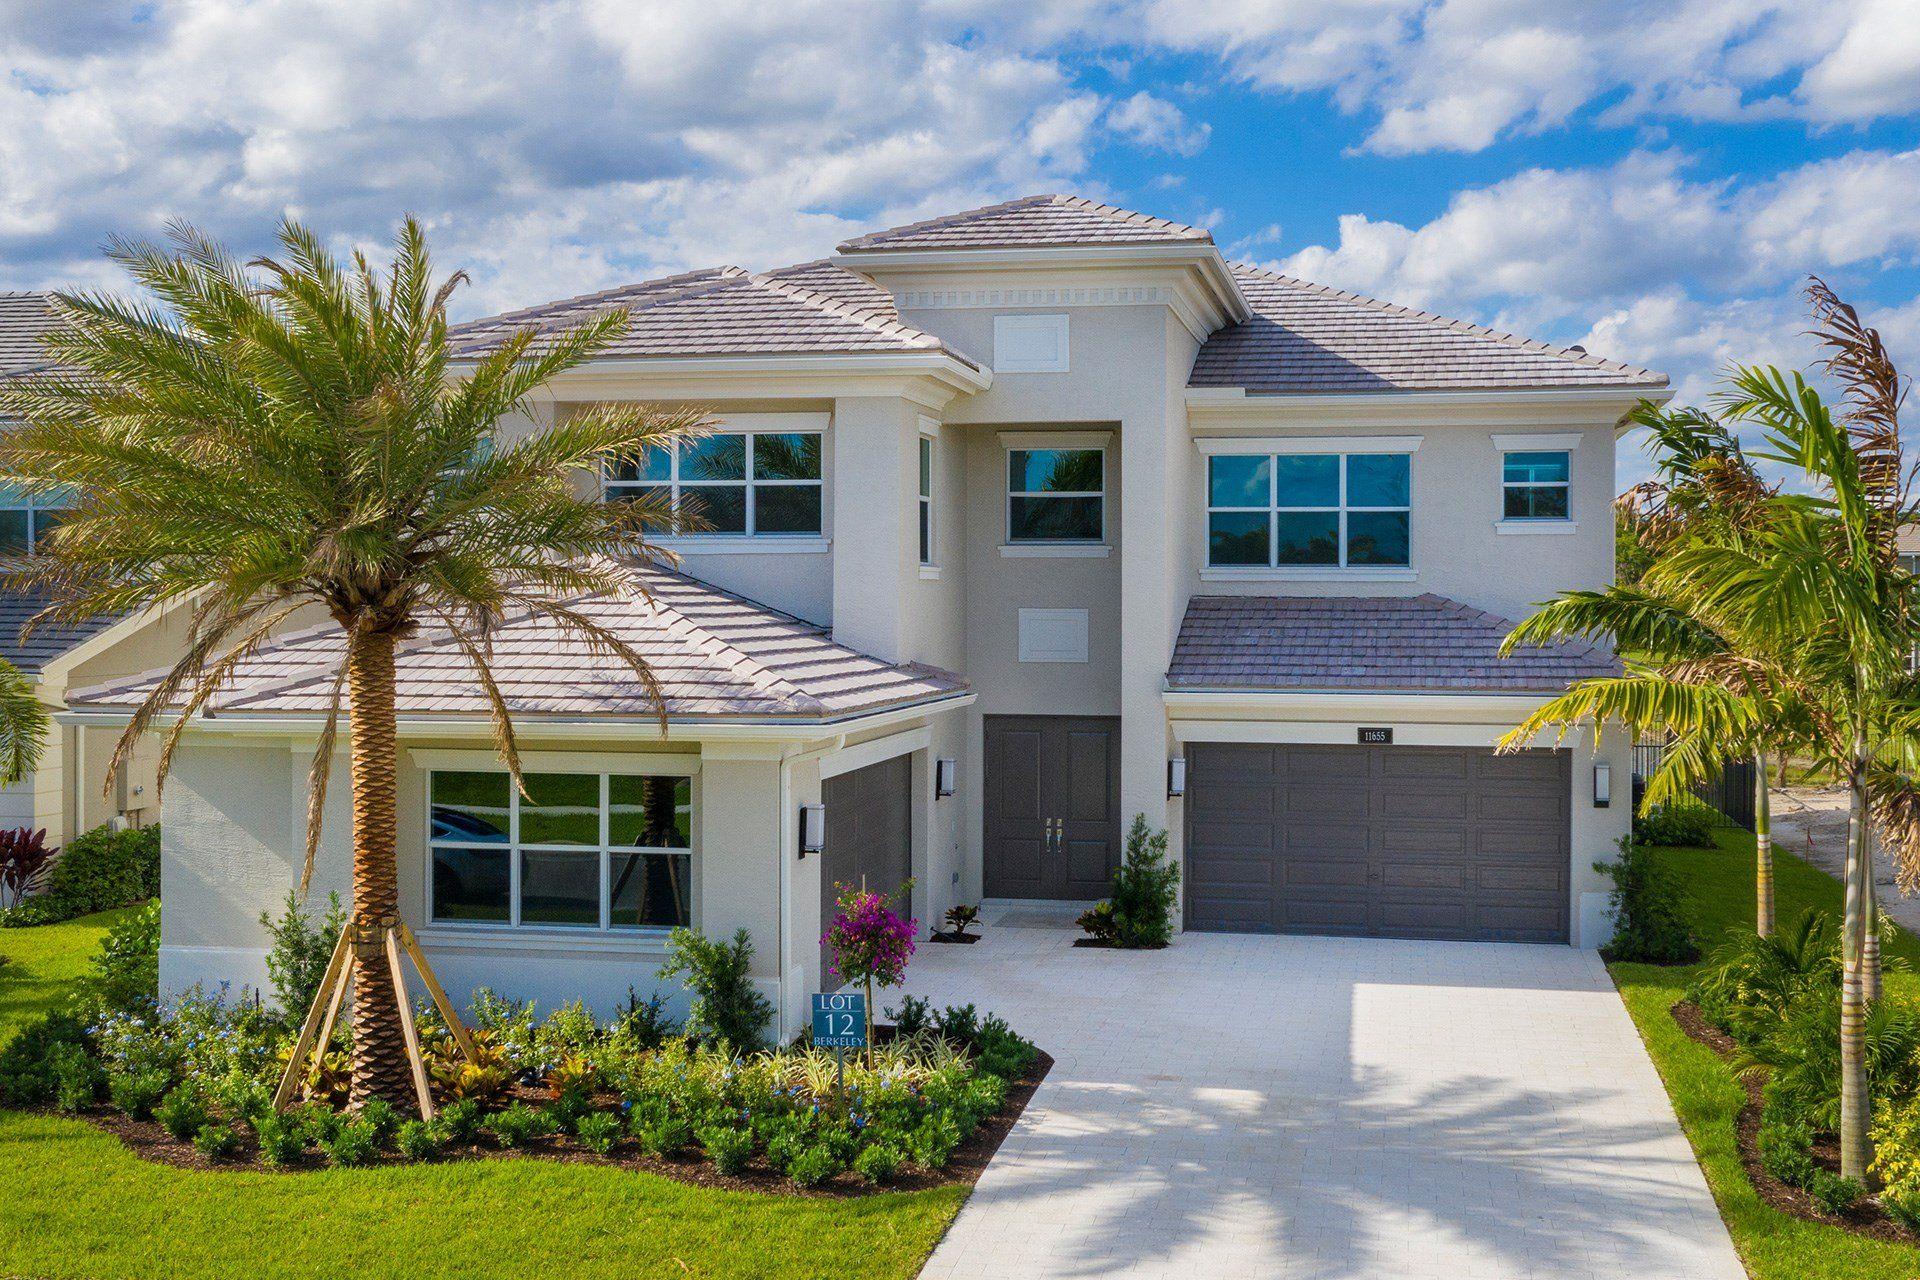 The Huntington Plan At Berkeley In Boca Raton Florida Florida Real Estate Gl Homes Florida Real Estate In 2020 Patio Upgrade Florida Real Estate Luxury Estate